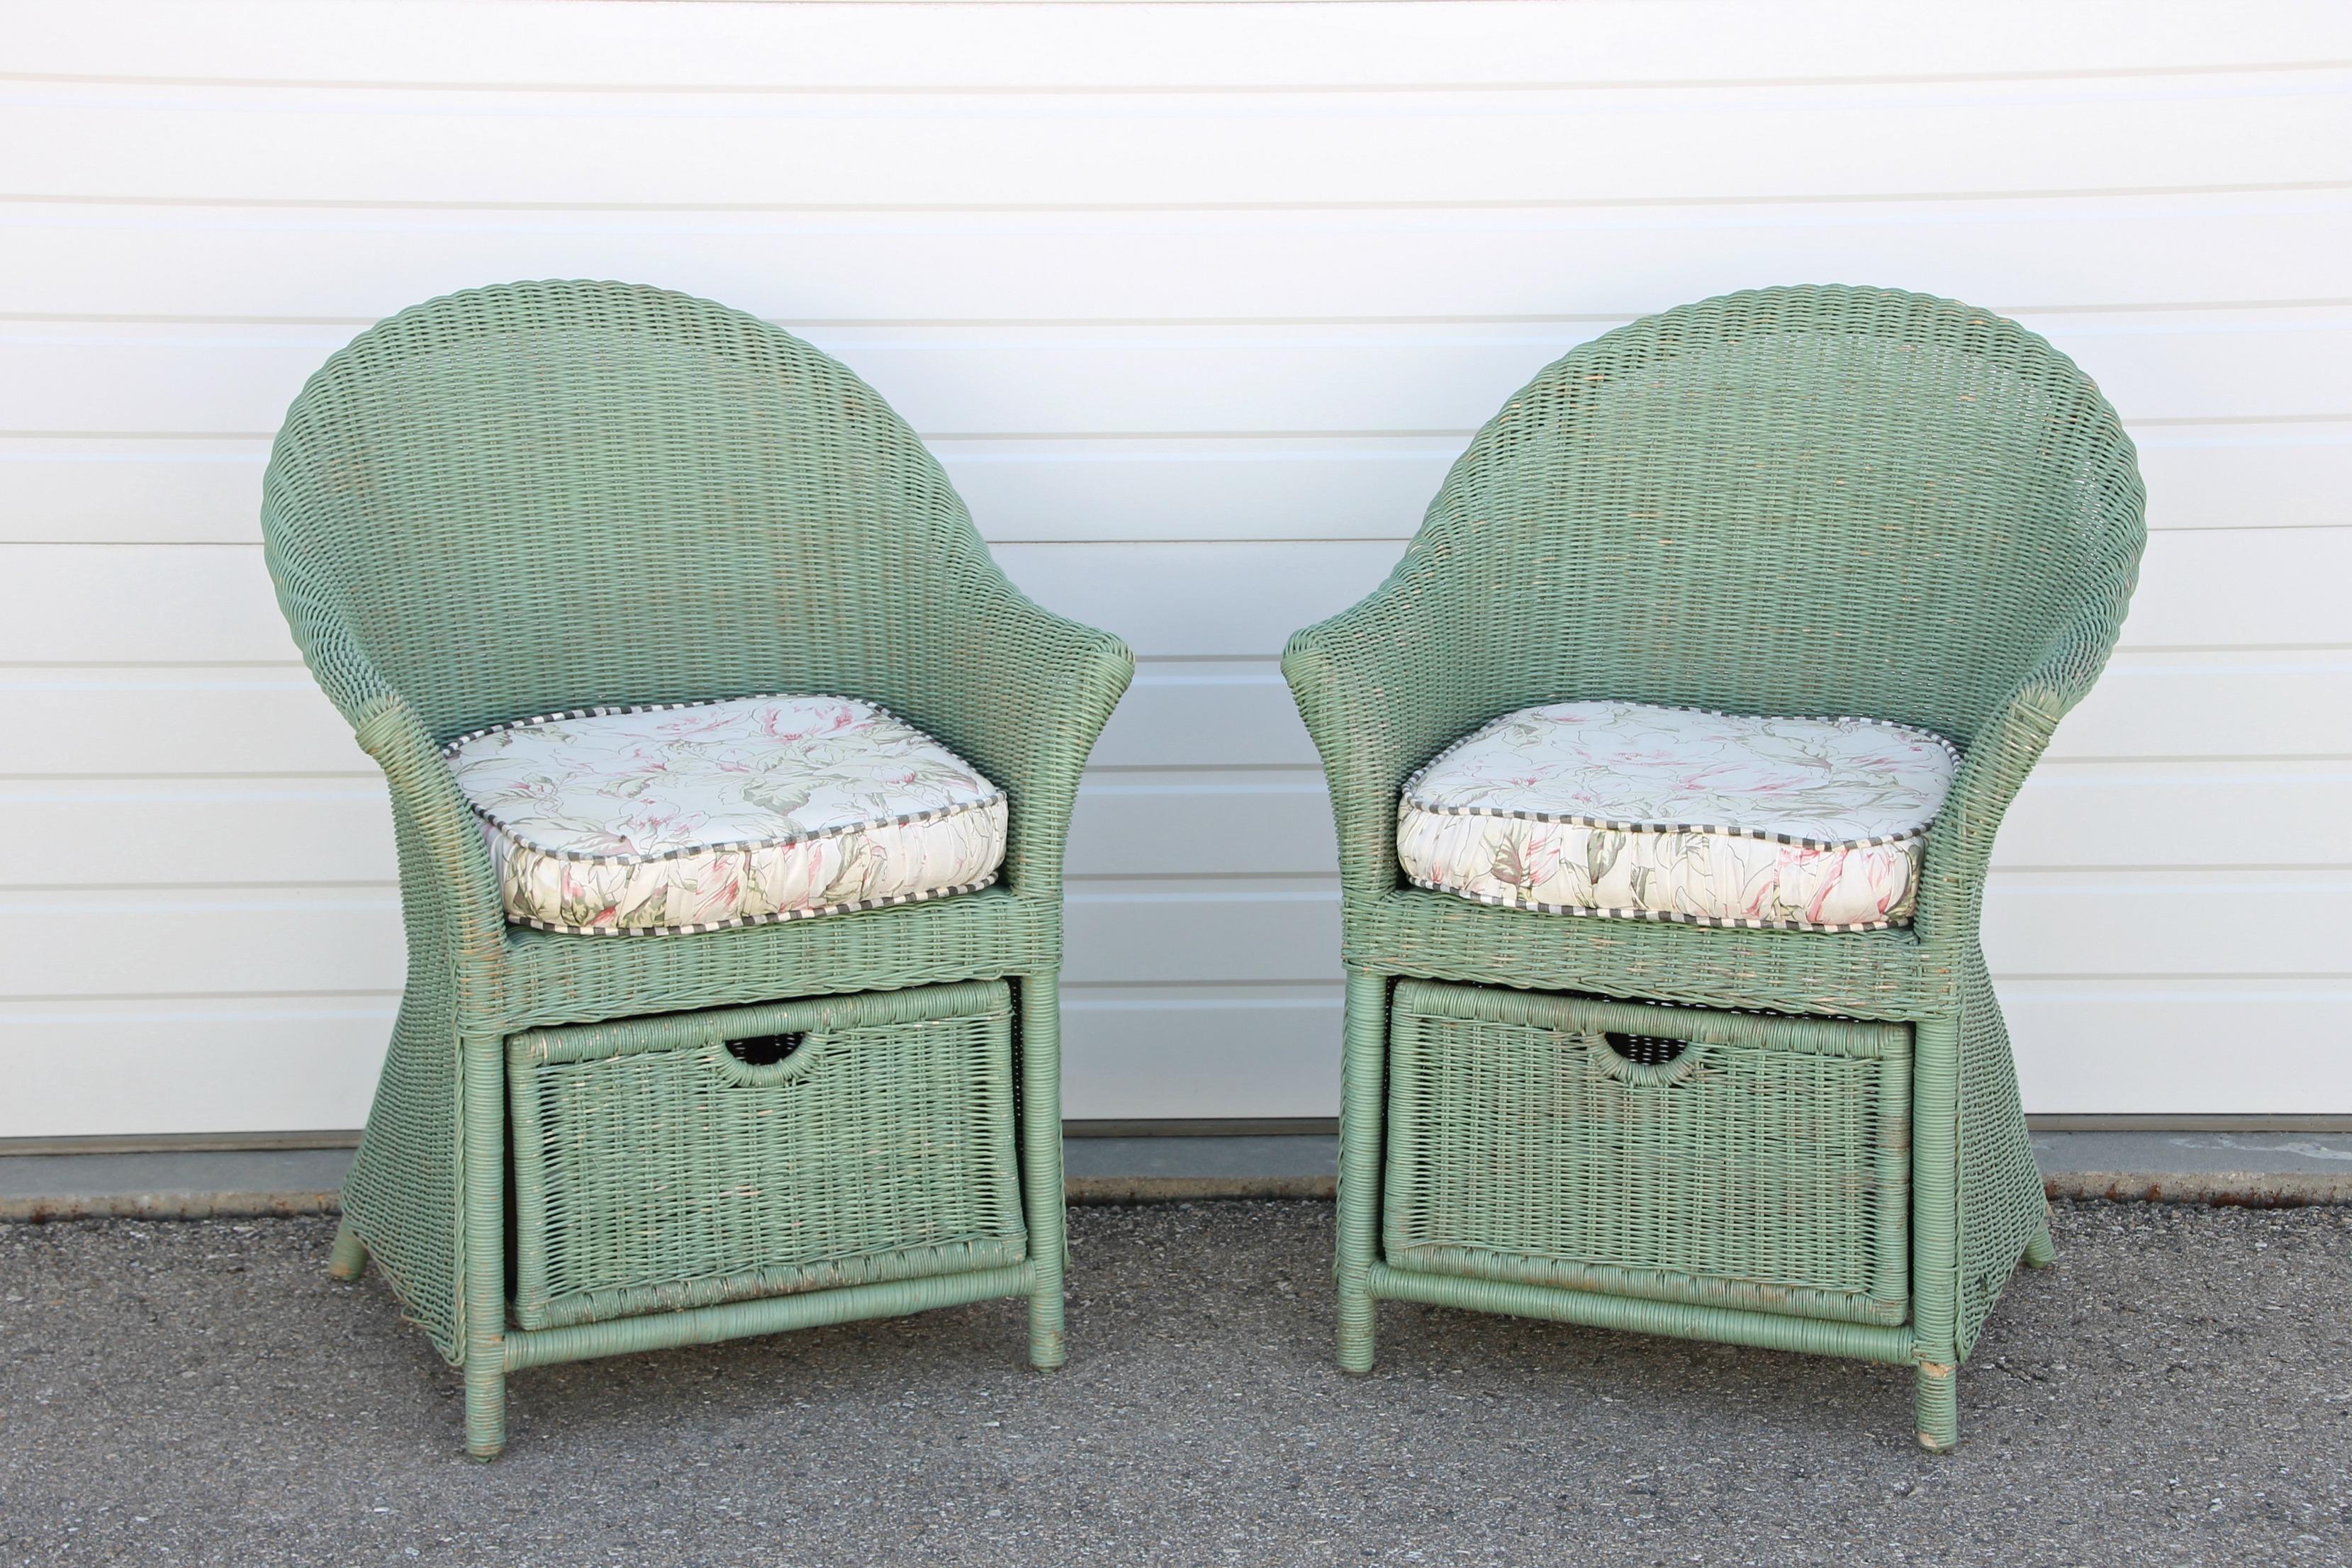 Green Wicker Chairs